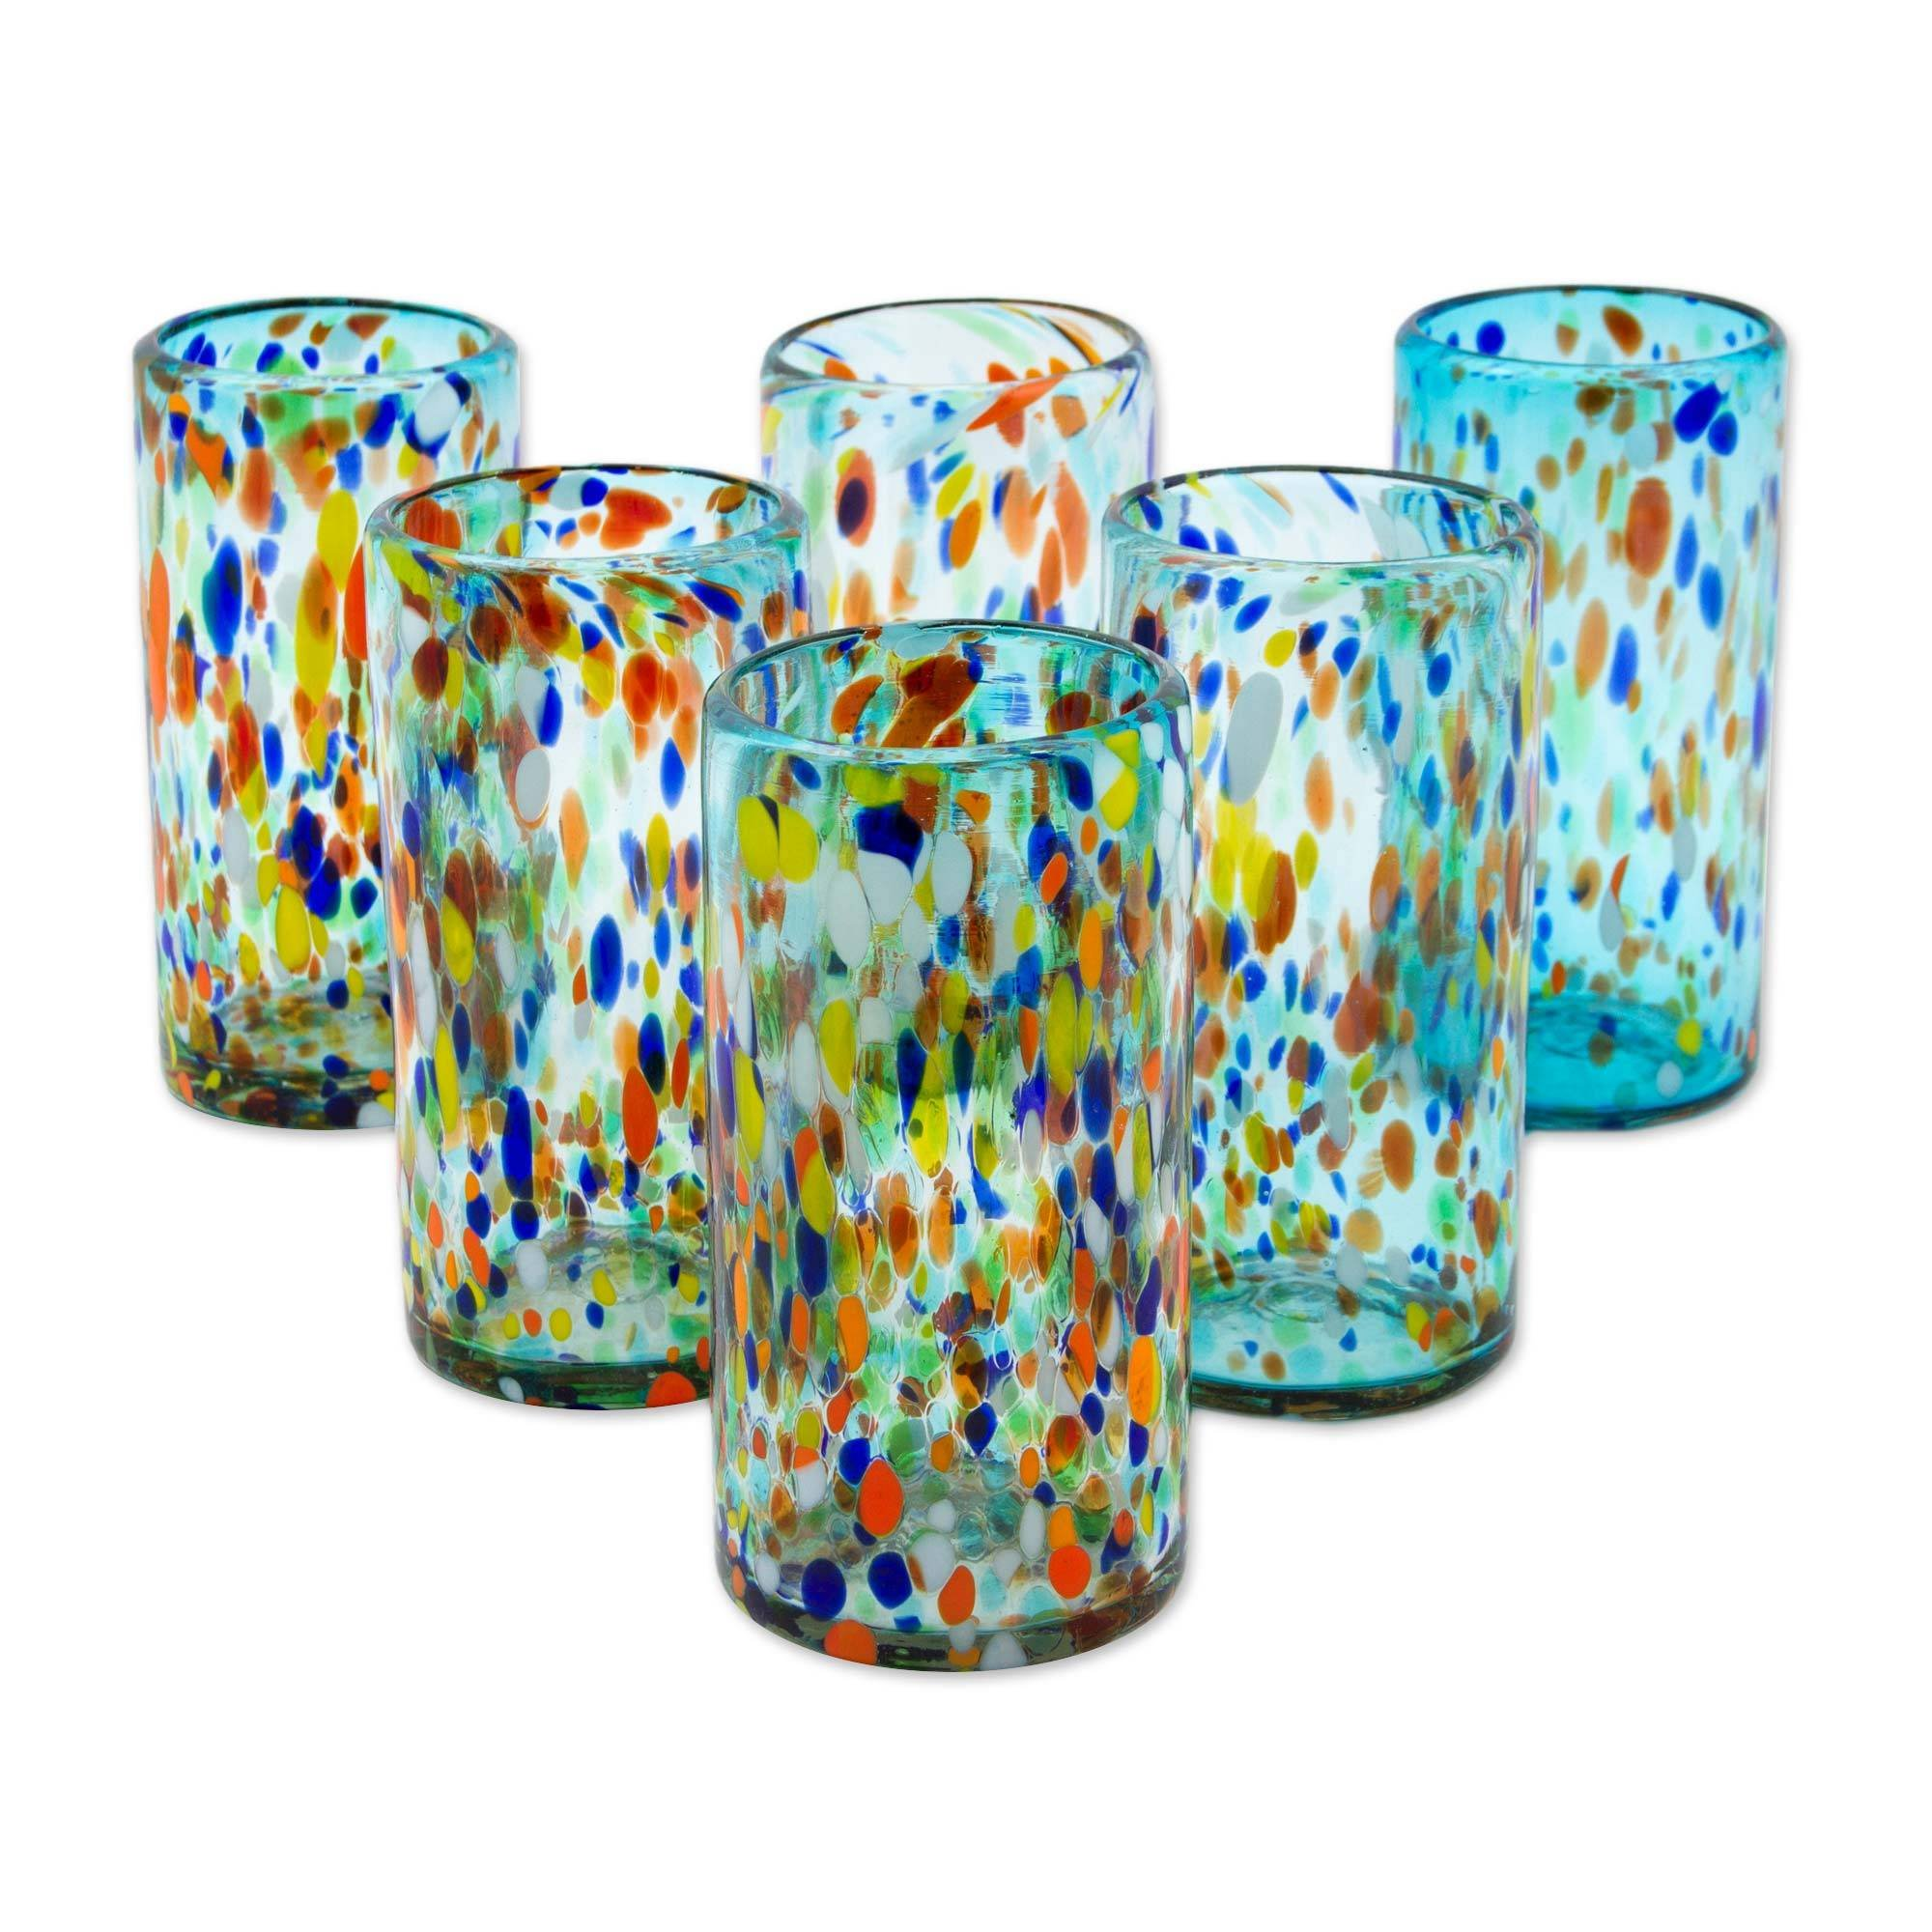 NOVICA Multicolor Eco-Friendly Hand Blown Glass Tumblers, 16 oz, Sky Rainbow Raindrops' (set of 6)